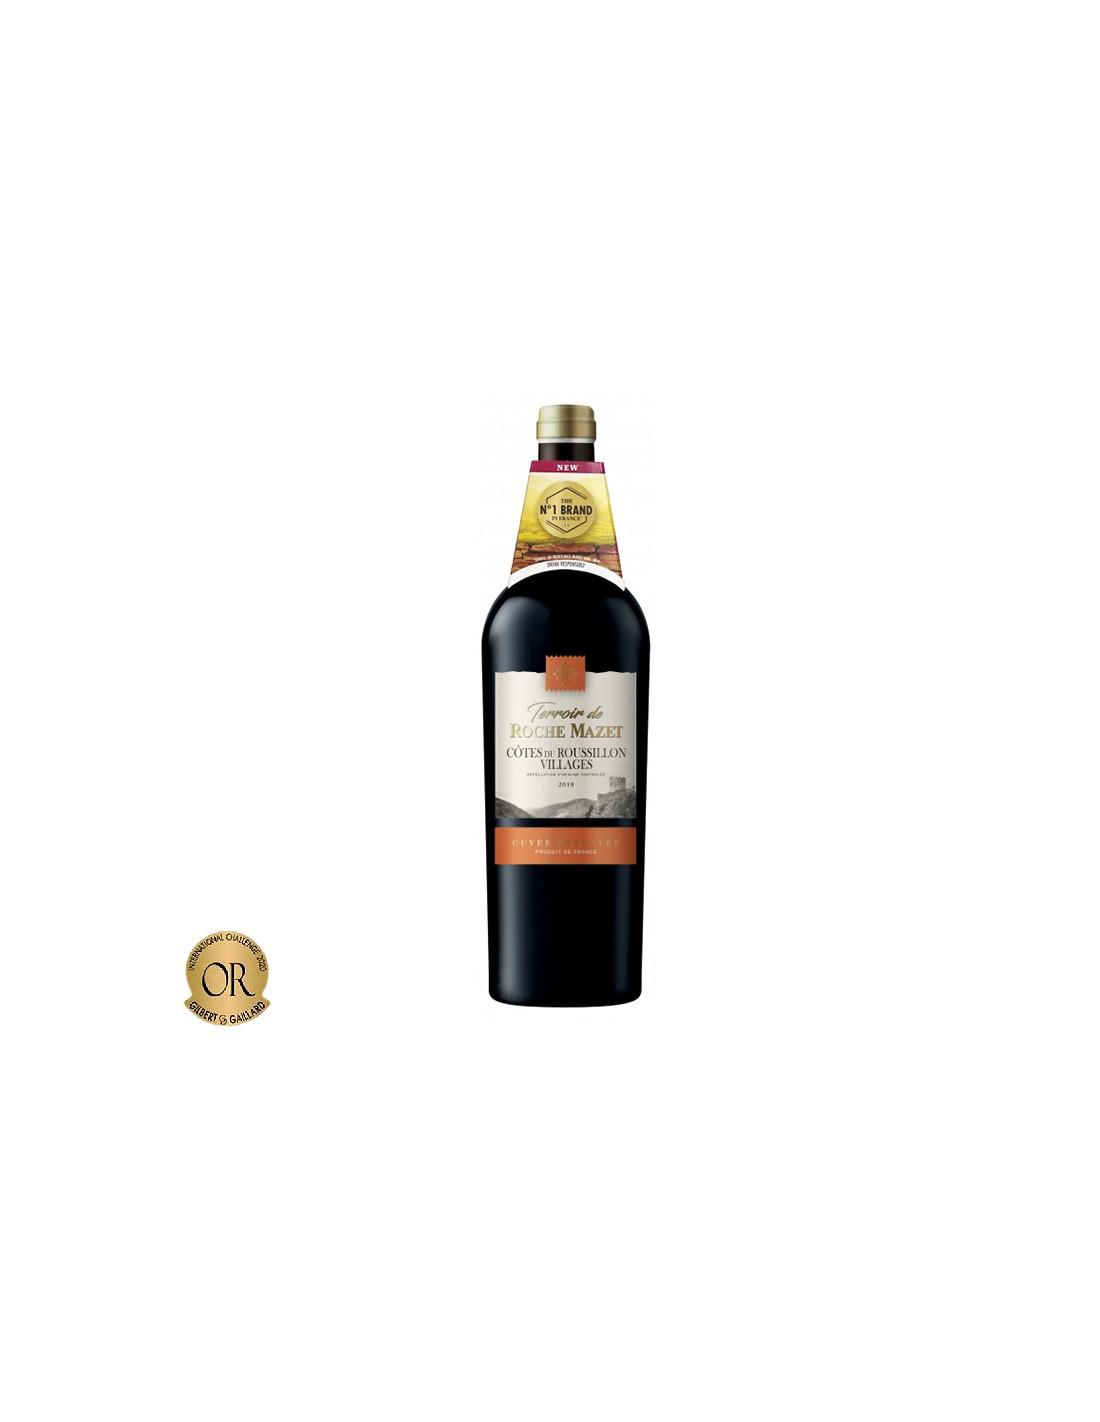 Vin rosu, Cupaj, Terroir de Roche Mazet, Cotes du Roussillon Cuvee Reserve, 0.75L, 14% alc., Franta